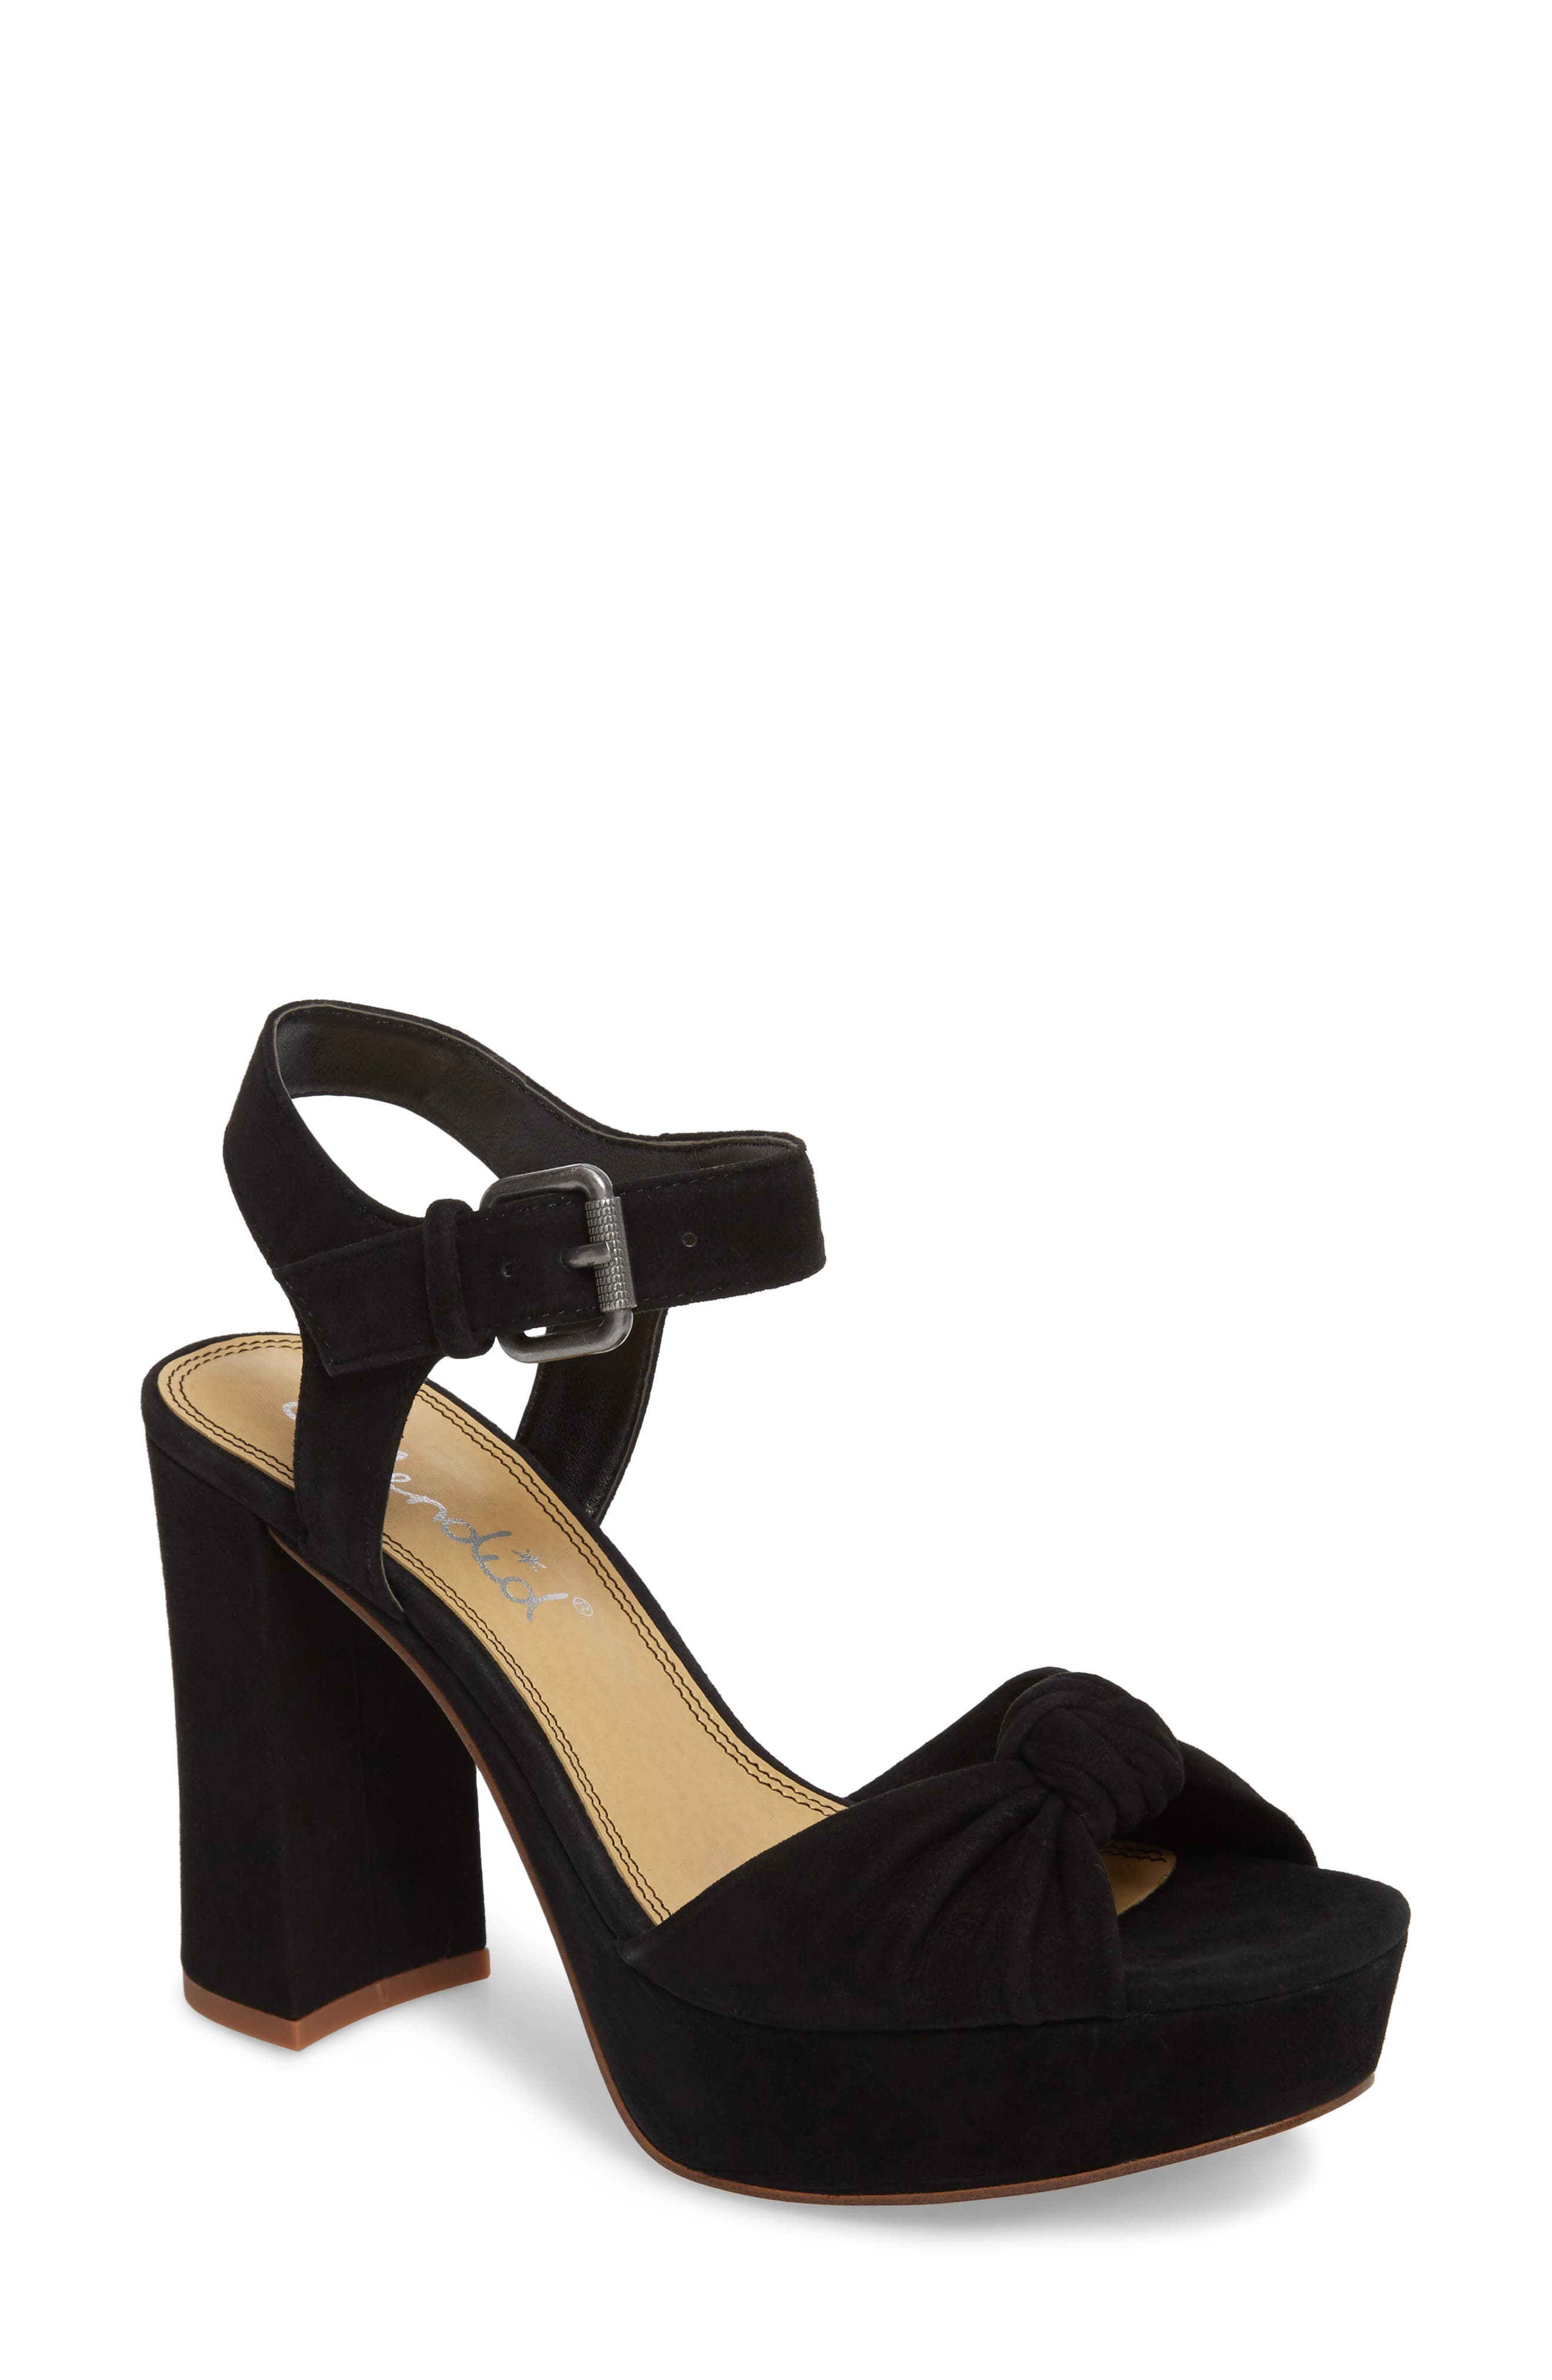 Splendid Bates Platform Sandal, Black